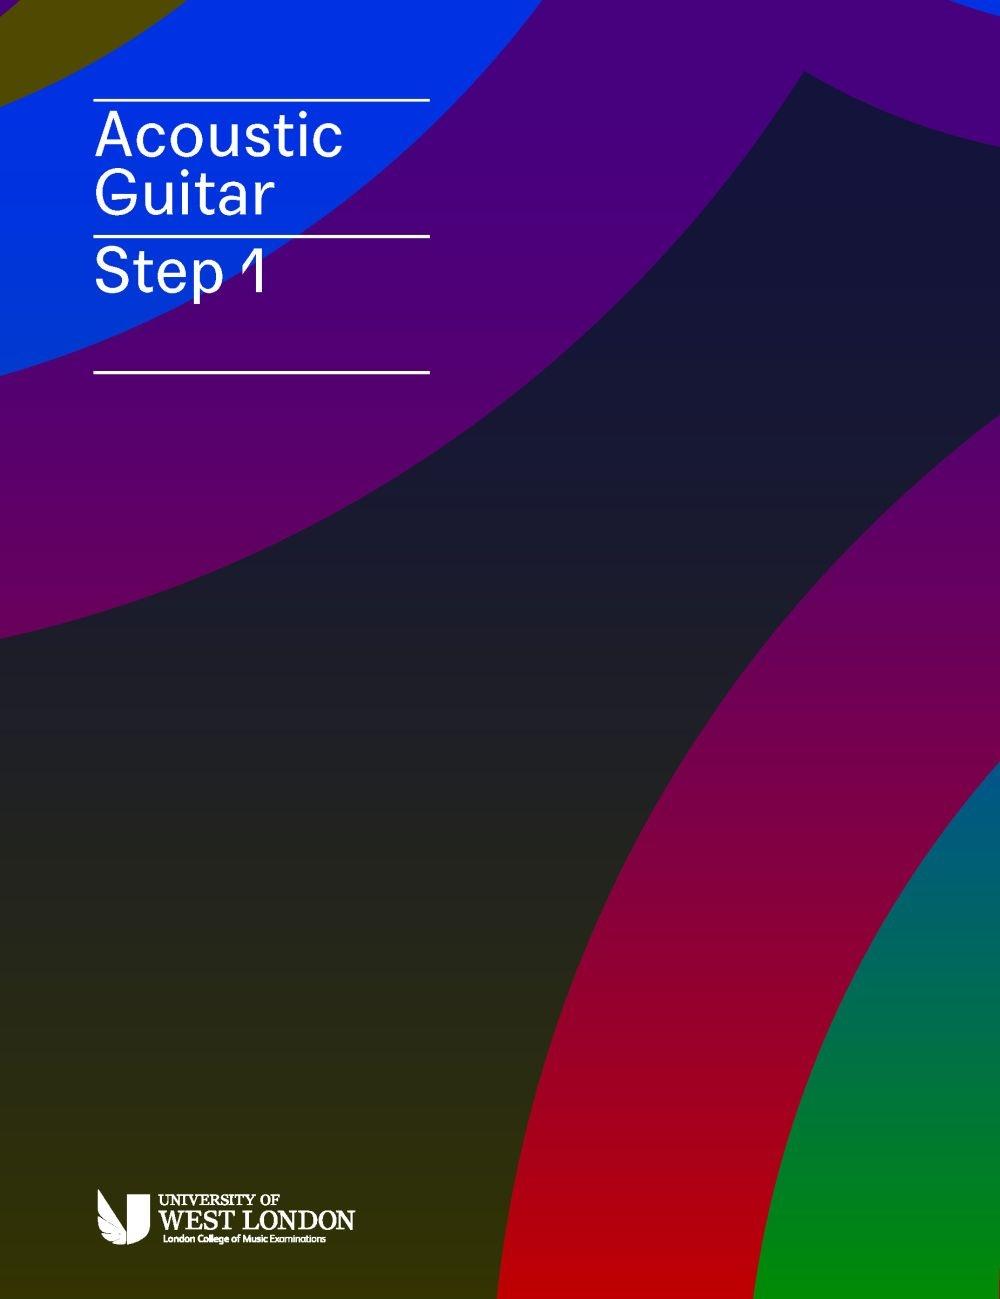 LCM Acoustic Guitar Handbook Step 1 2020: Acoustic Guitar: Instrumental Tutor